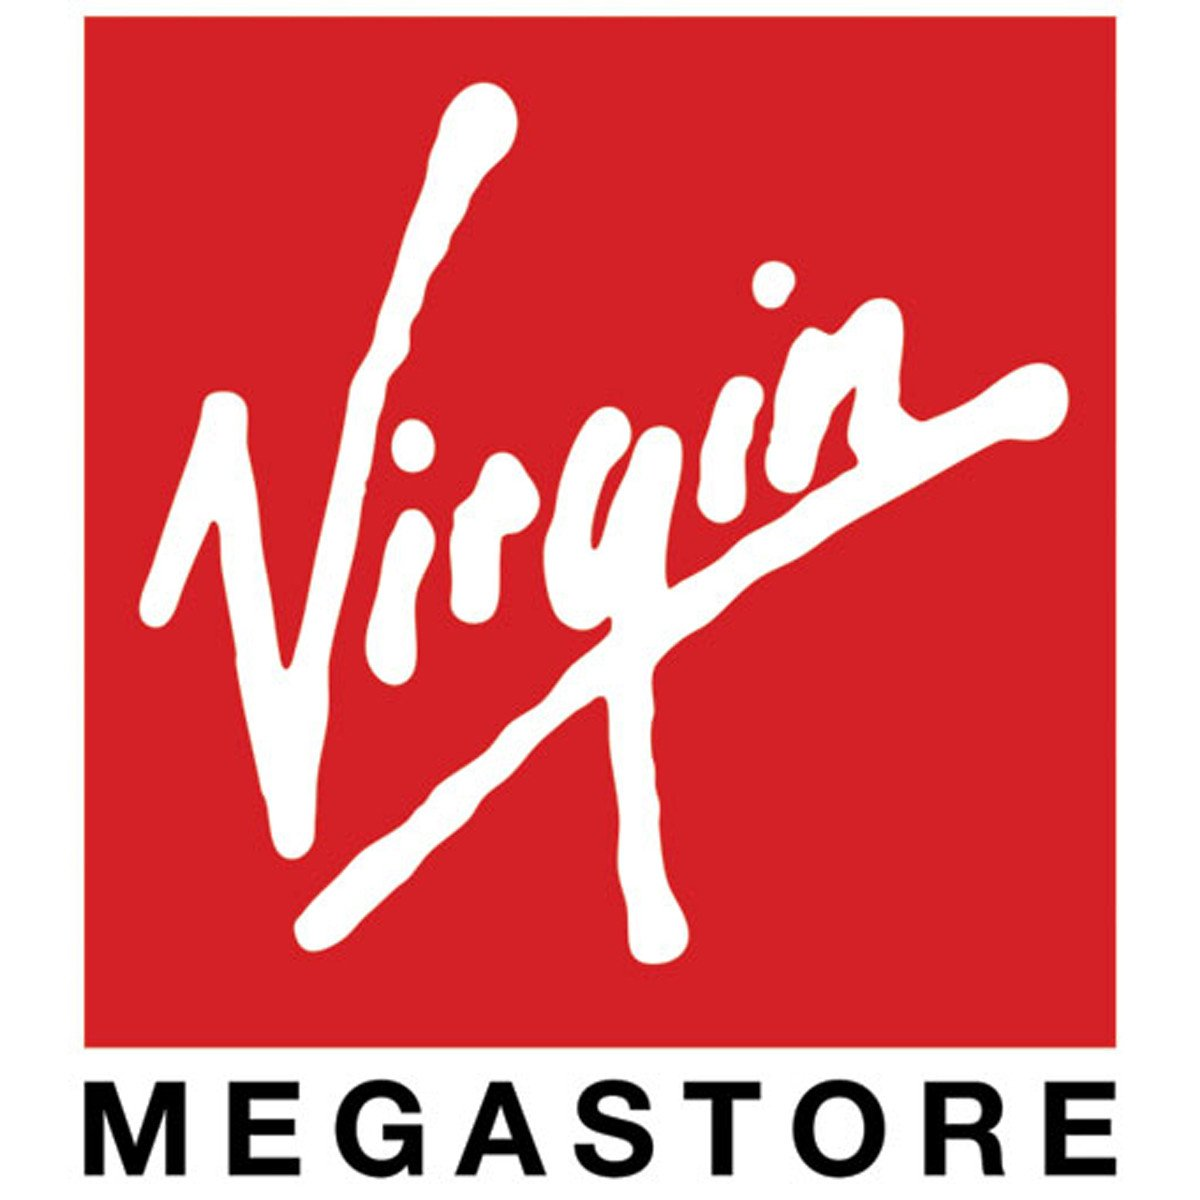 virgin_logo_2.jpg